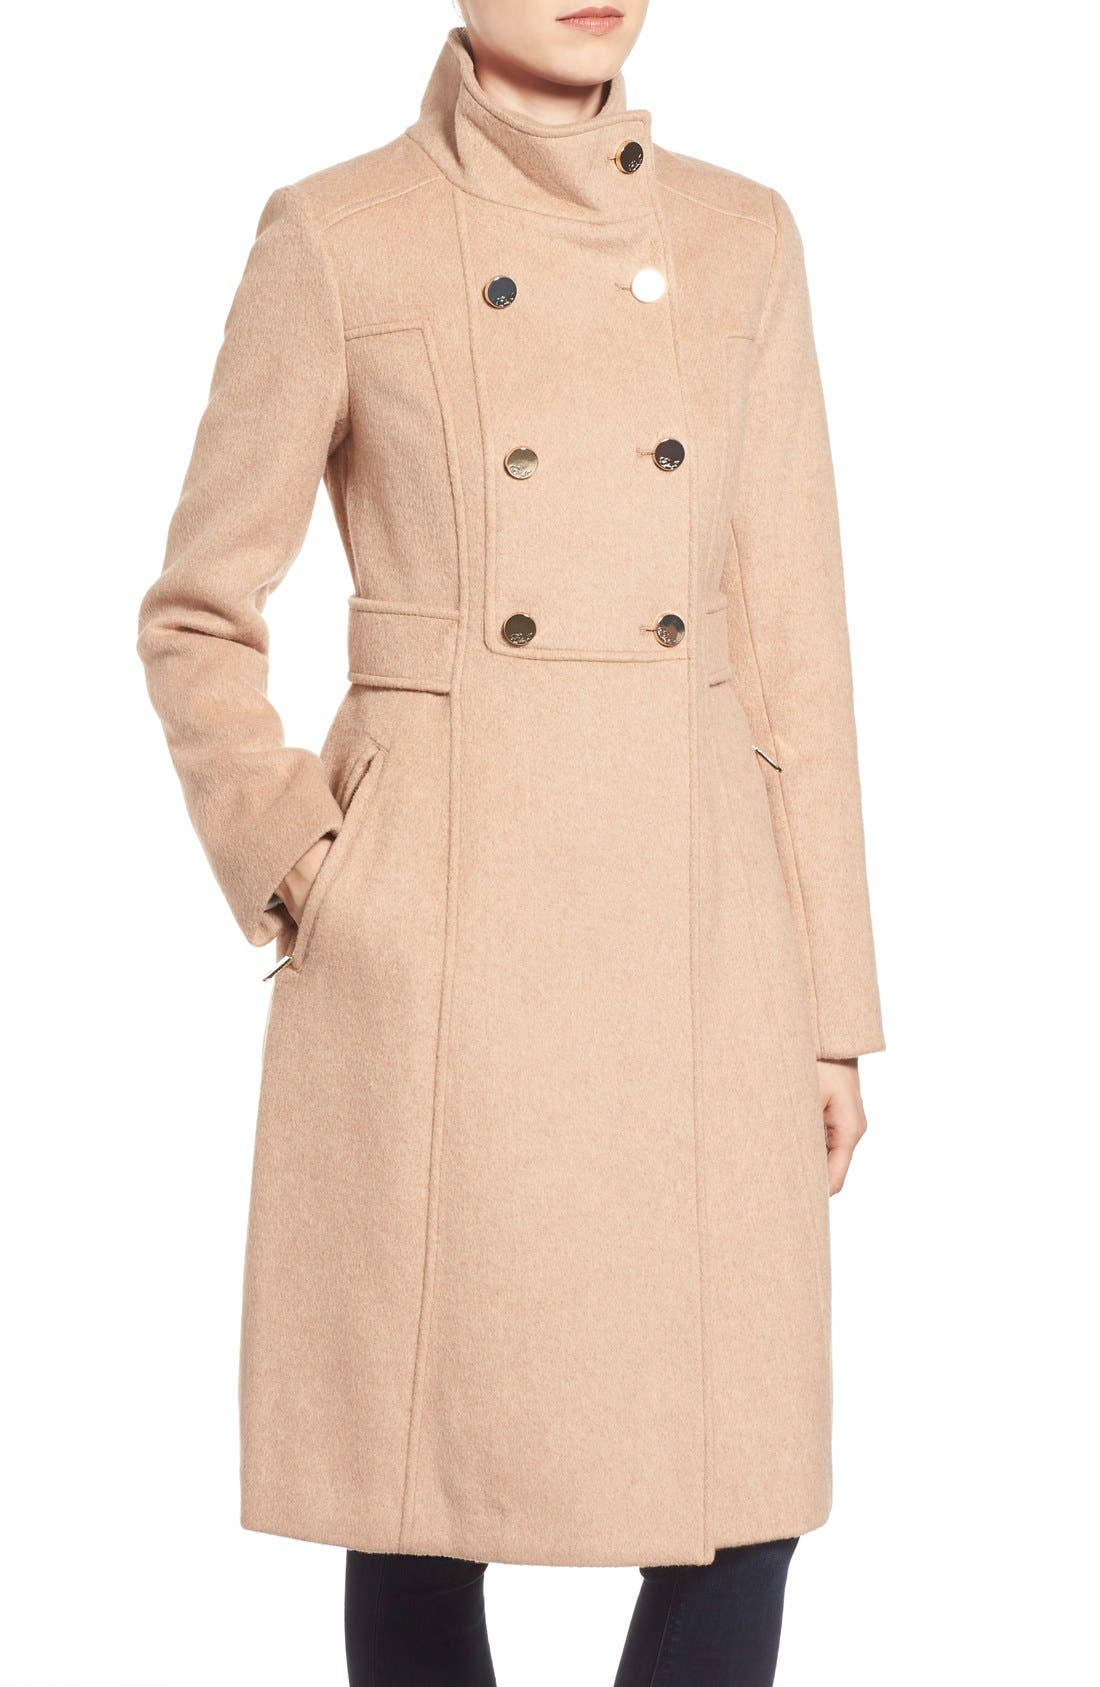 Wool Blend Long Military Coat,                             Alternate thumbnail 4, color,                             Camel